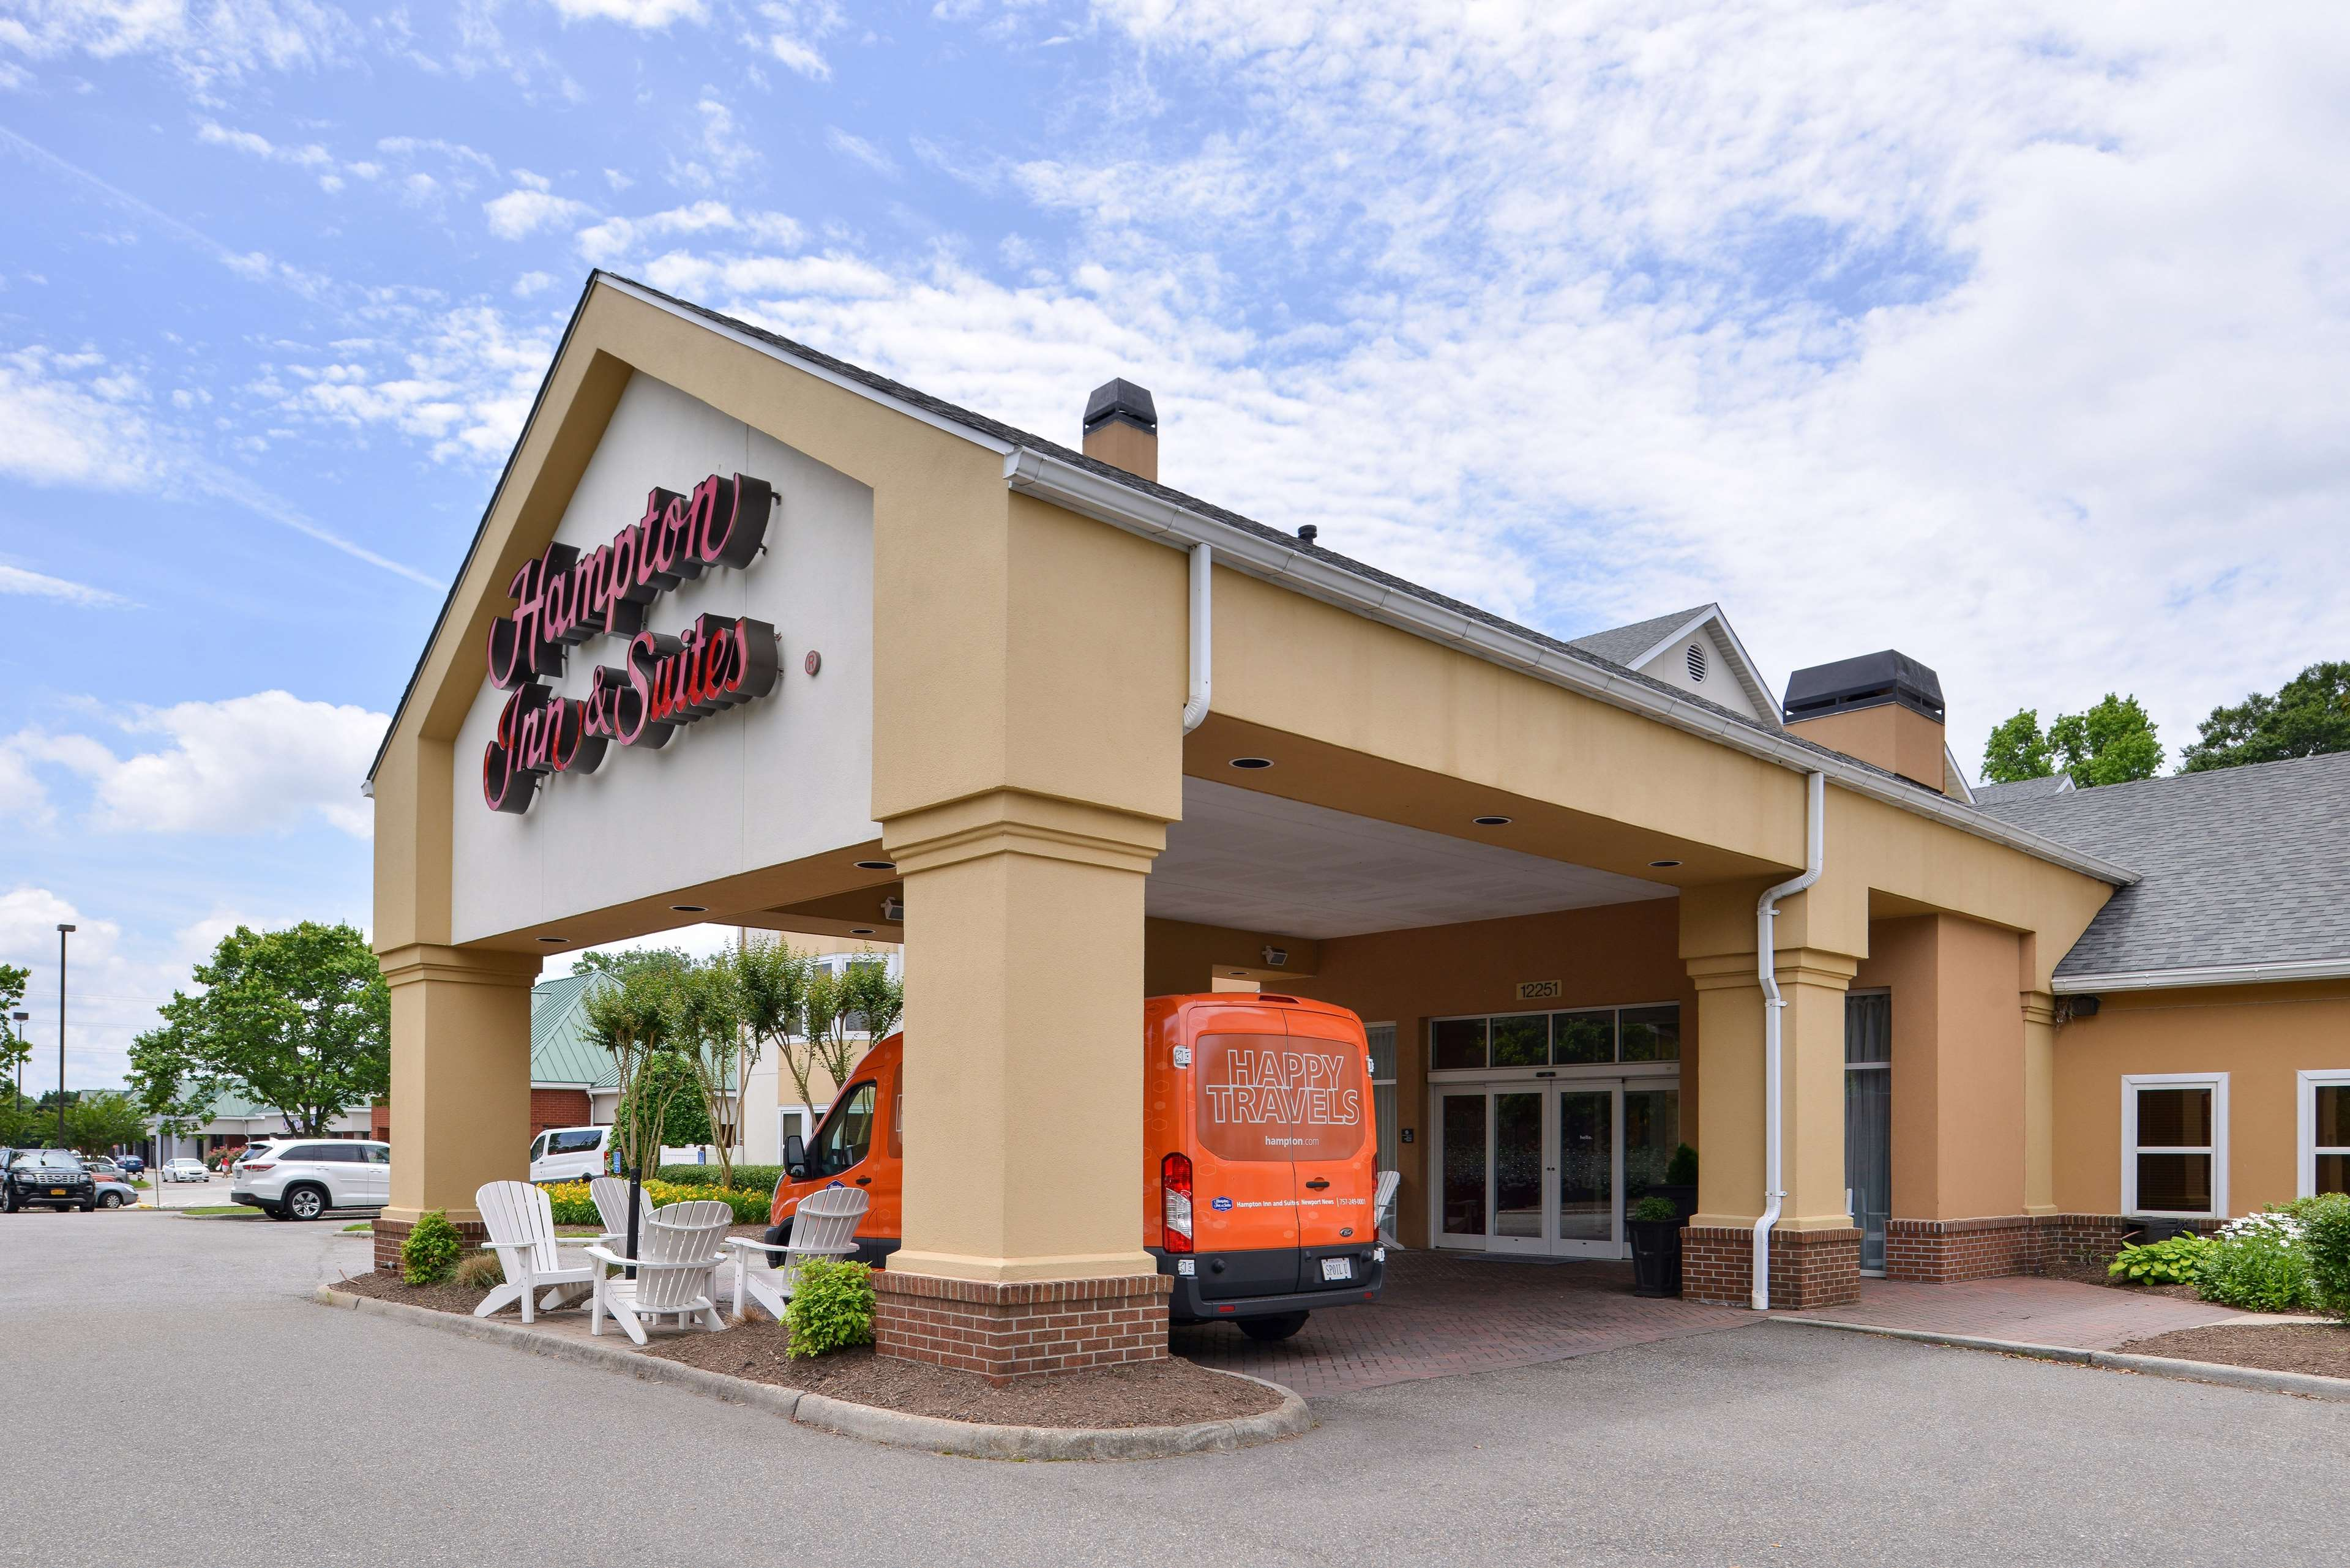 Hampton Inn & Suites Newport News (Oyster Point) image 2